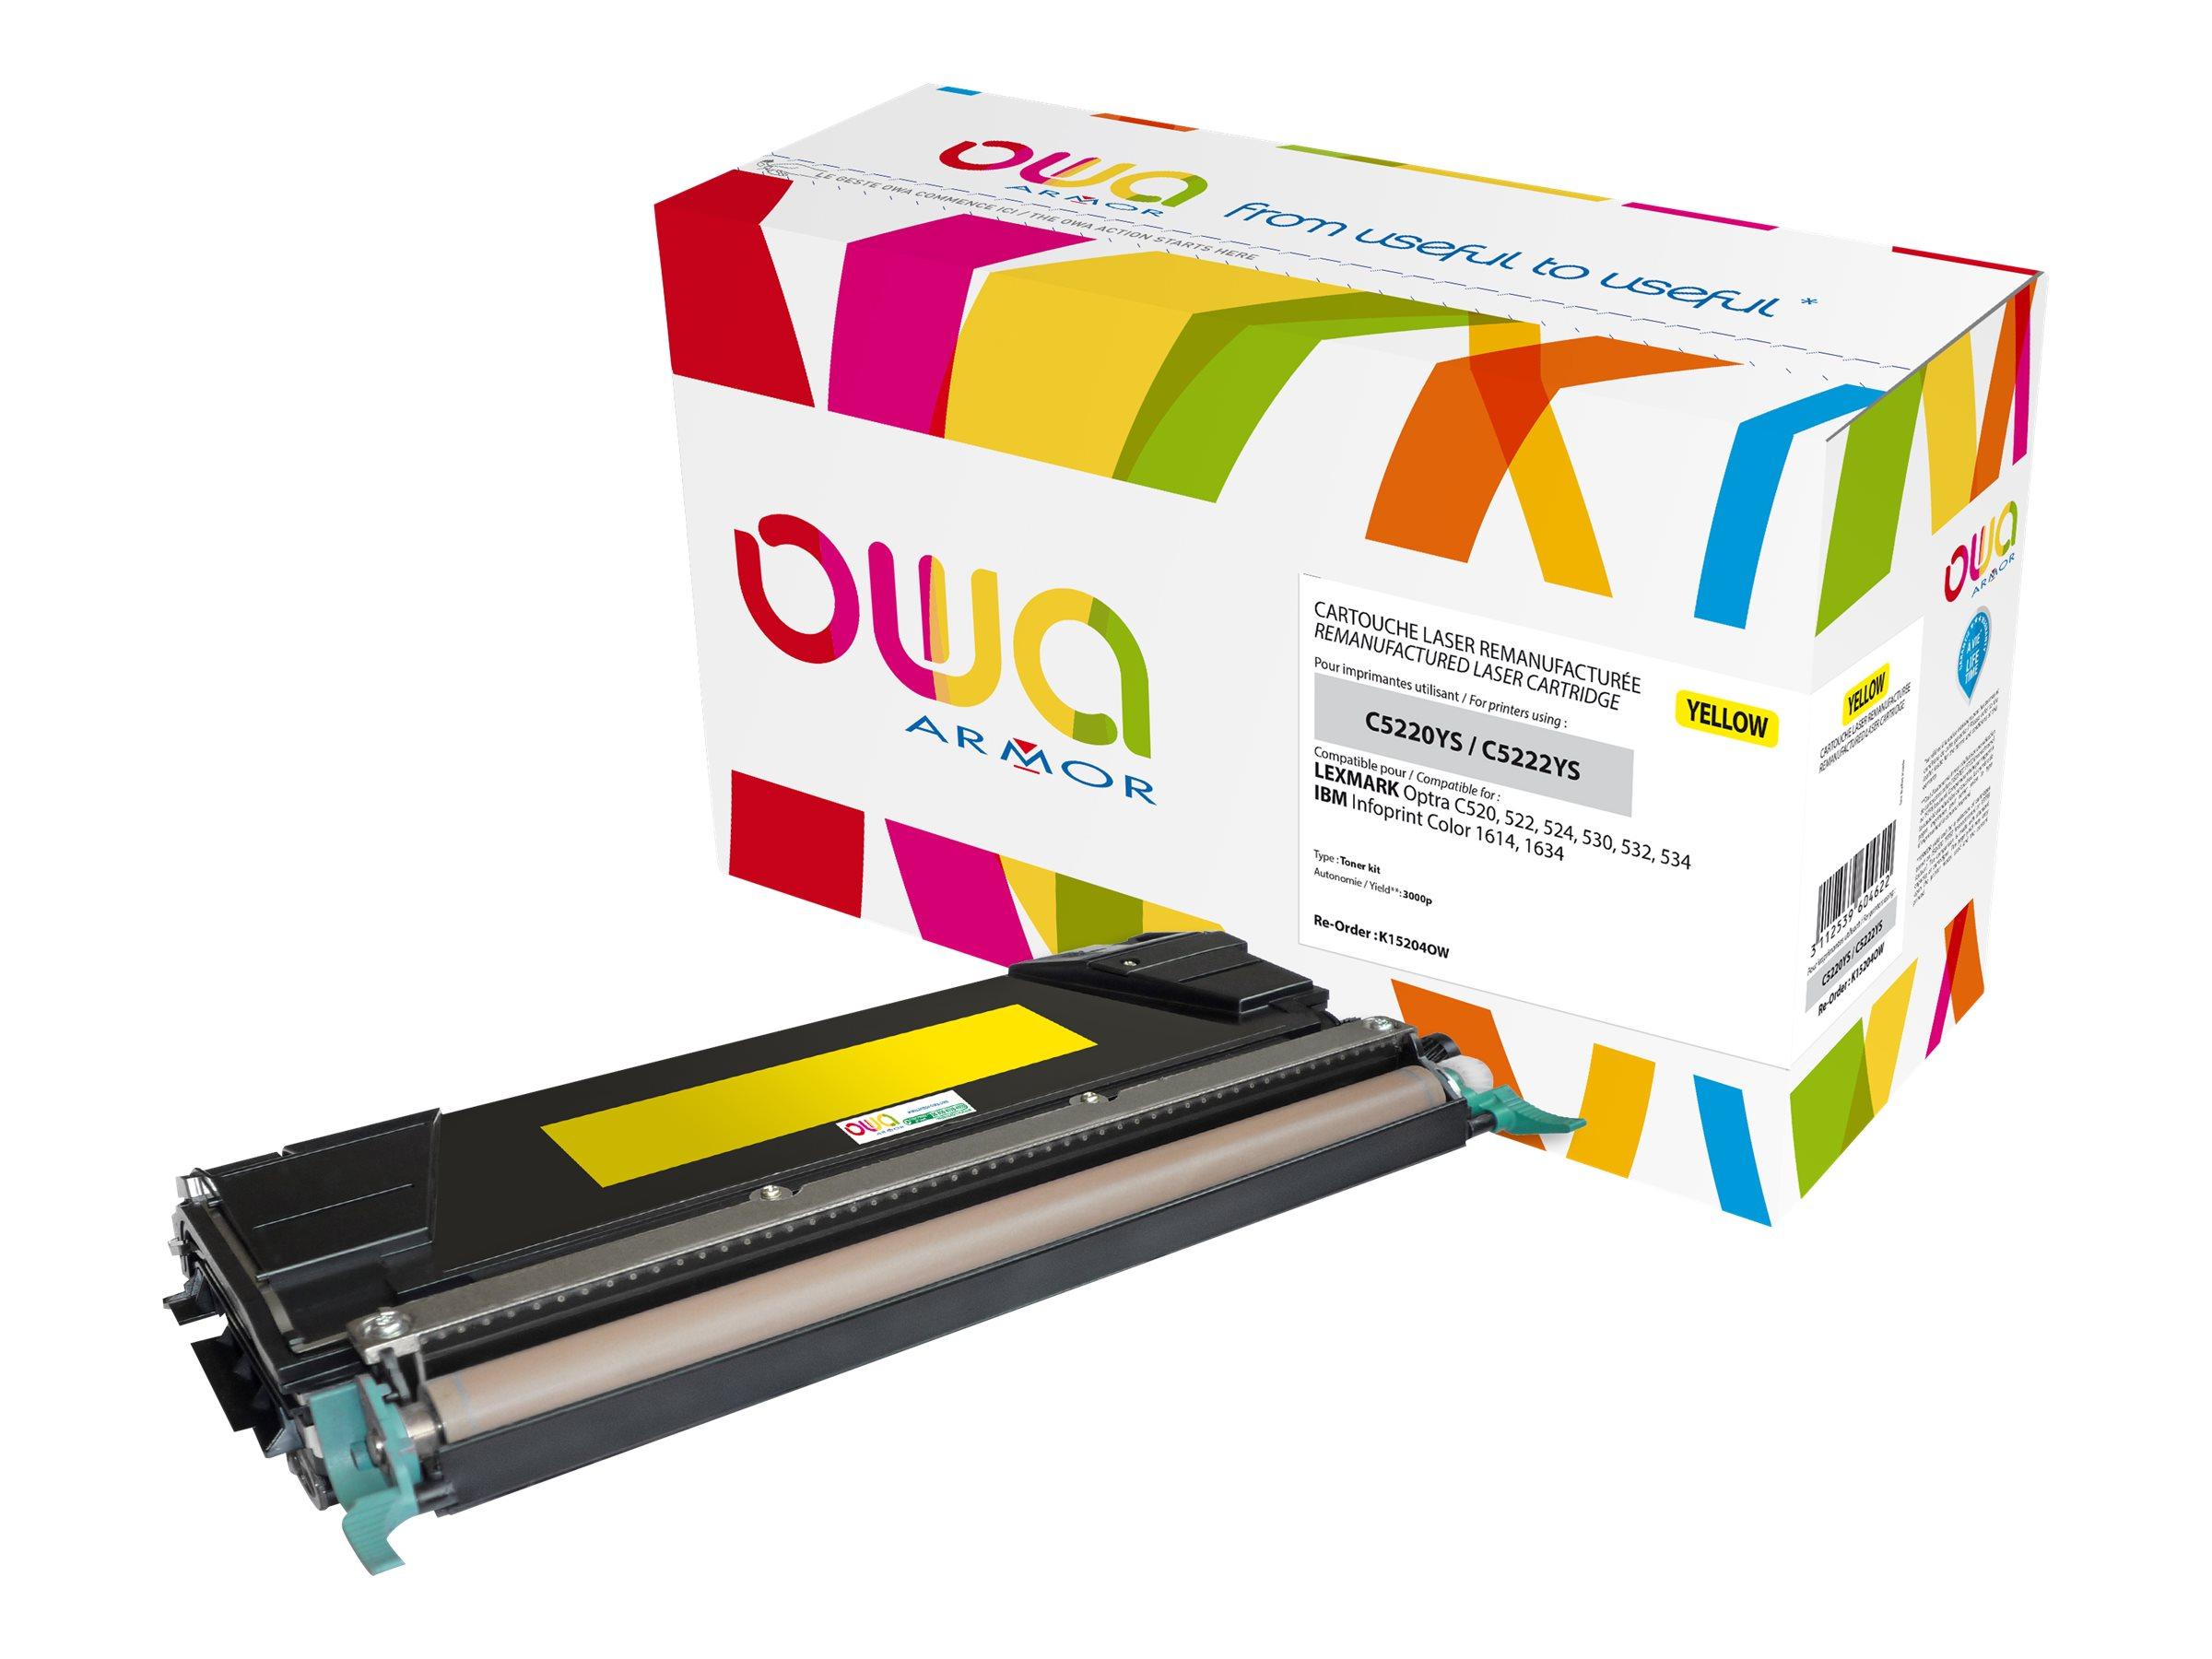 Lexmark C5220YS/C5222YS - remanufacturé OWA K15204OW - jaune - cartouche laser